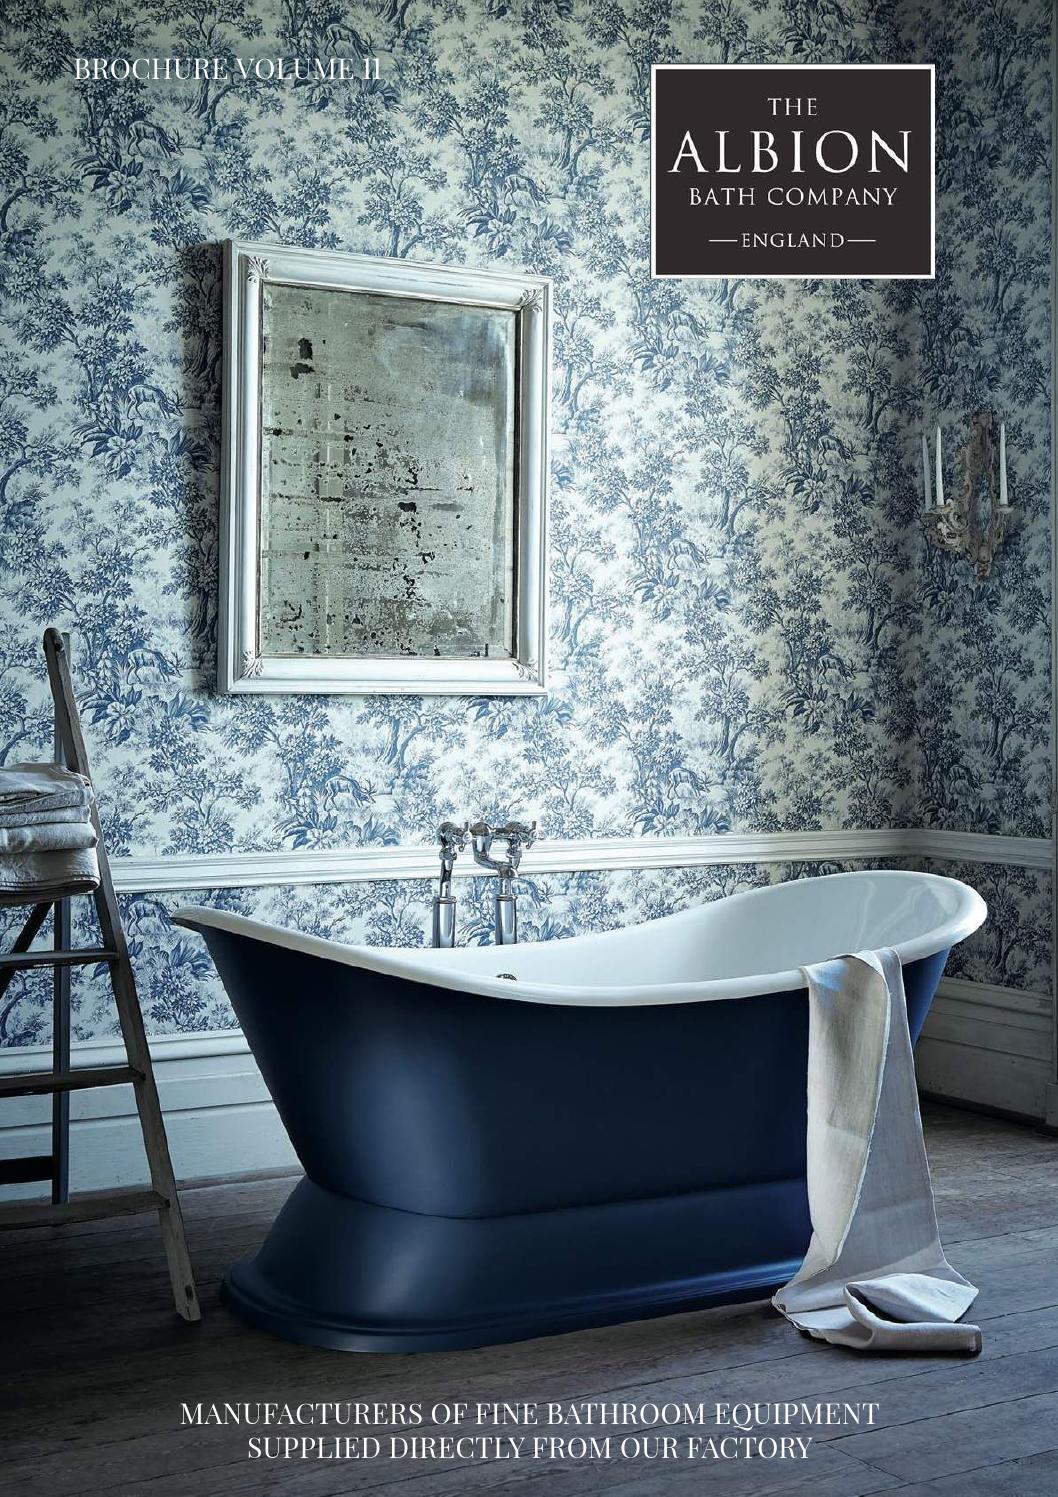 Albion Bath Co Nederland by Albion Bath Company - issuu